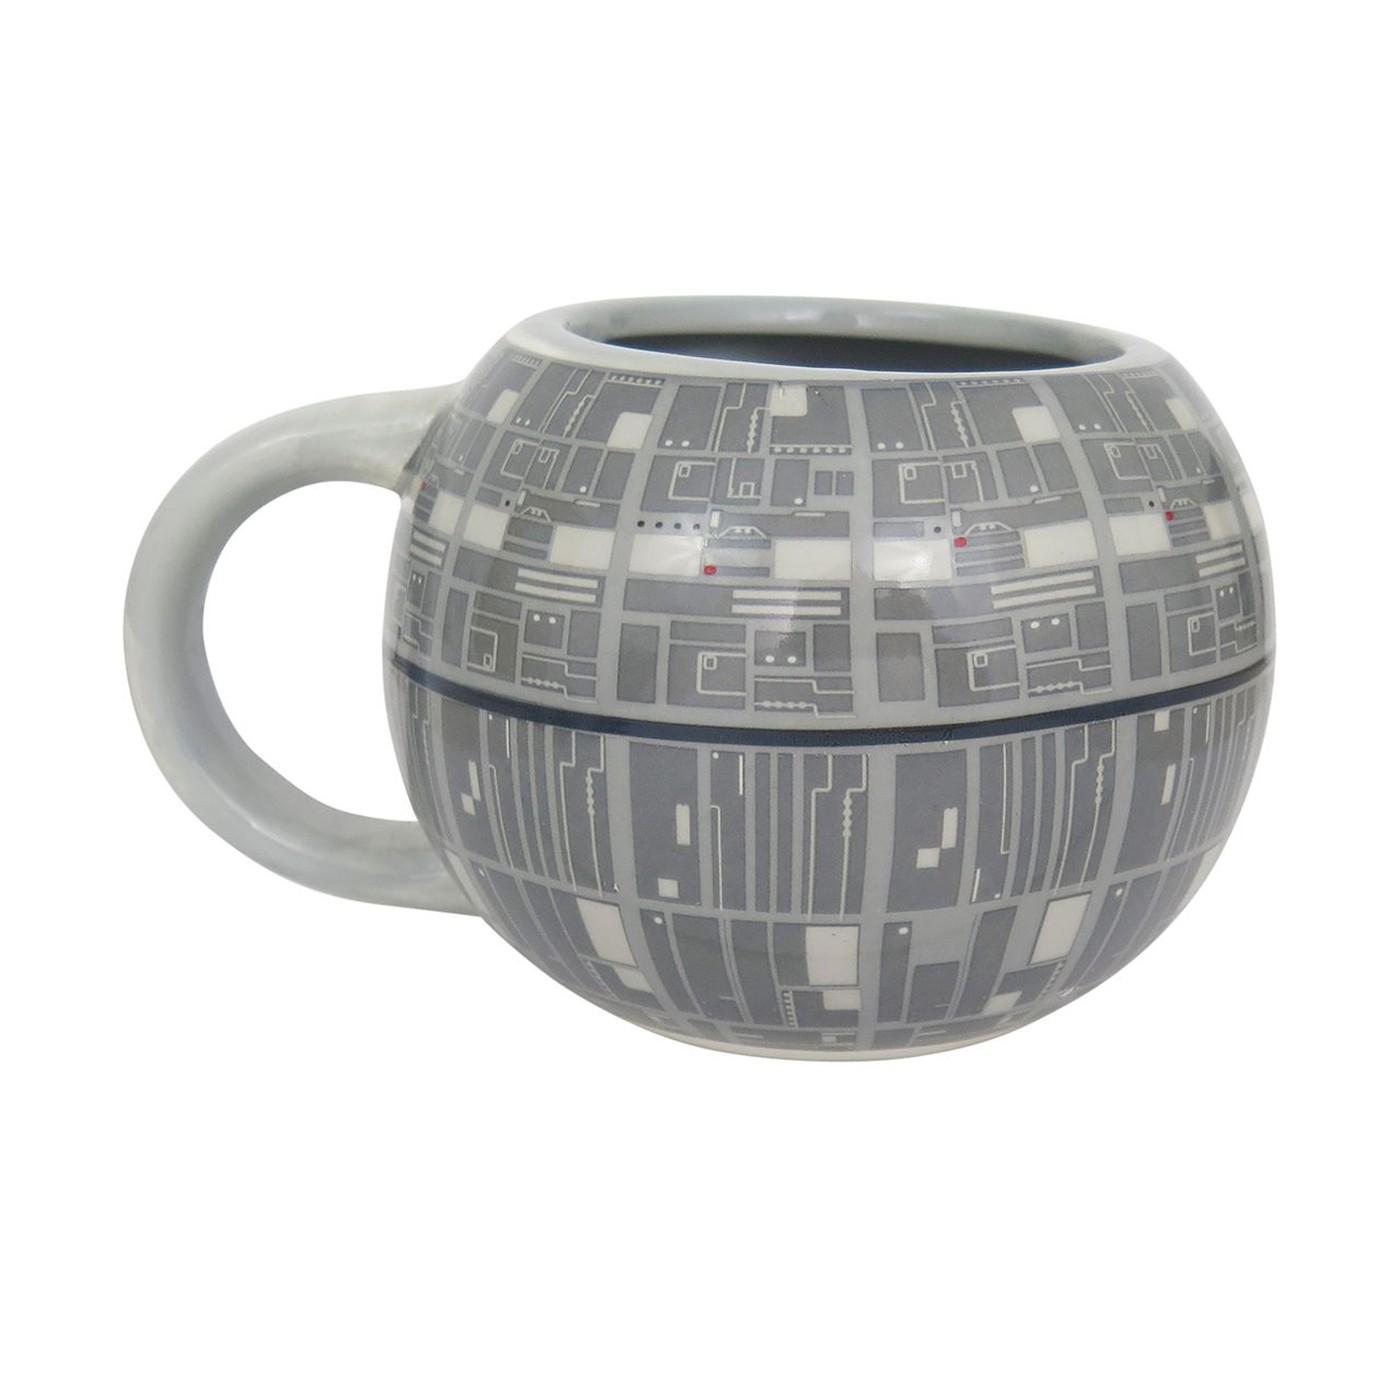 Star Wars Death Star Sculpted Ceramic Mug